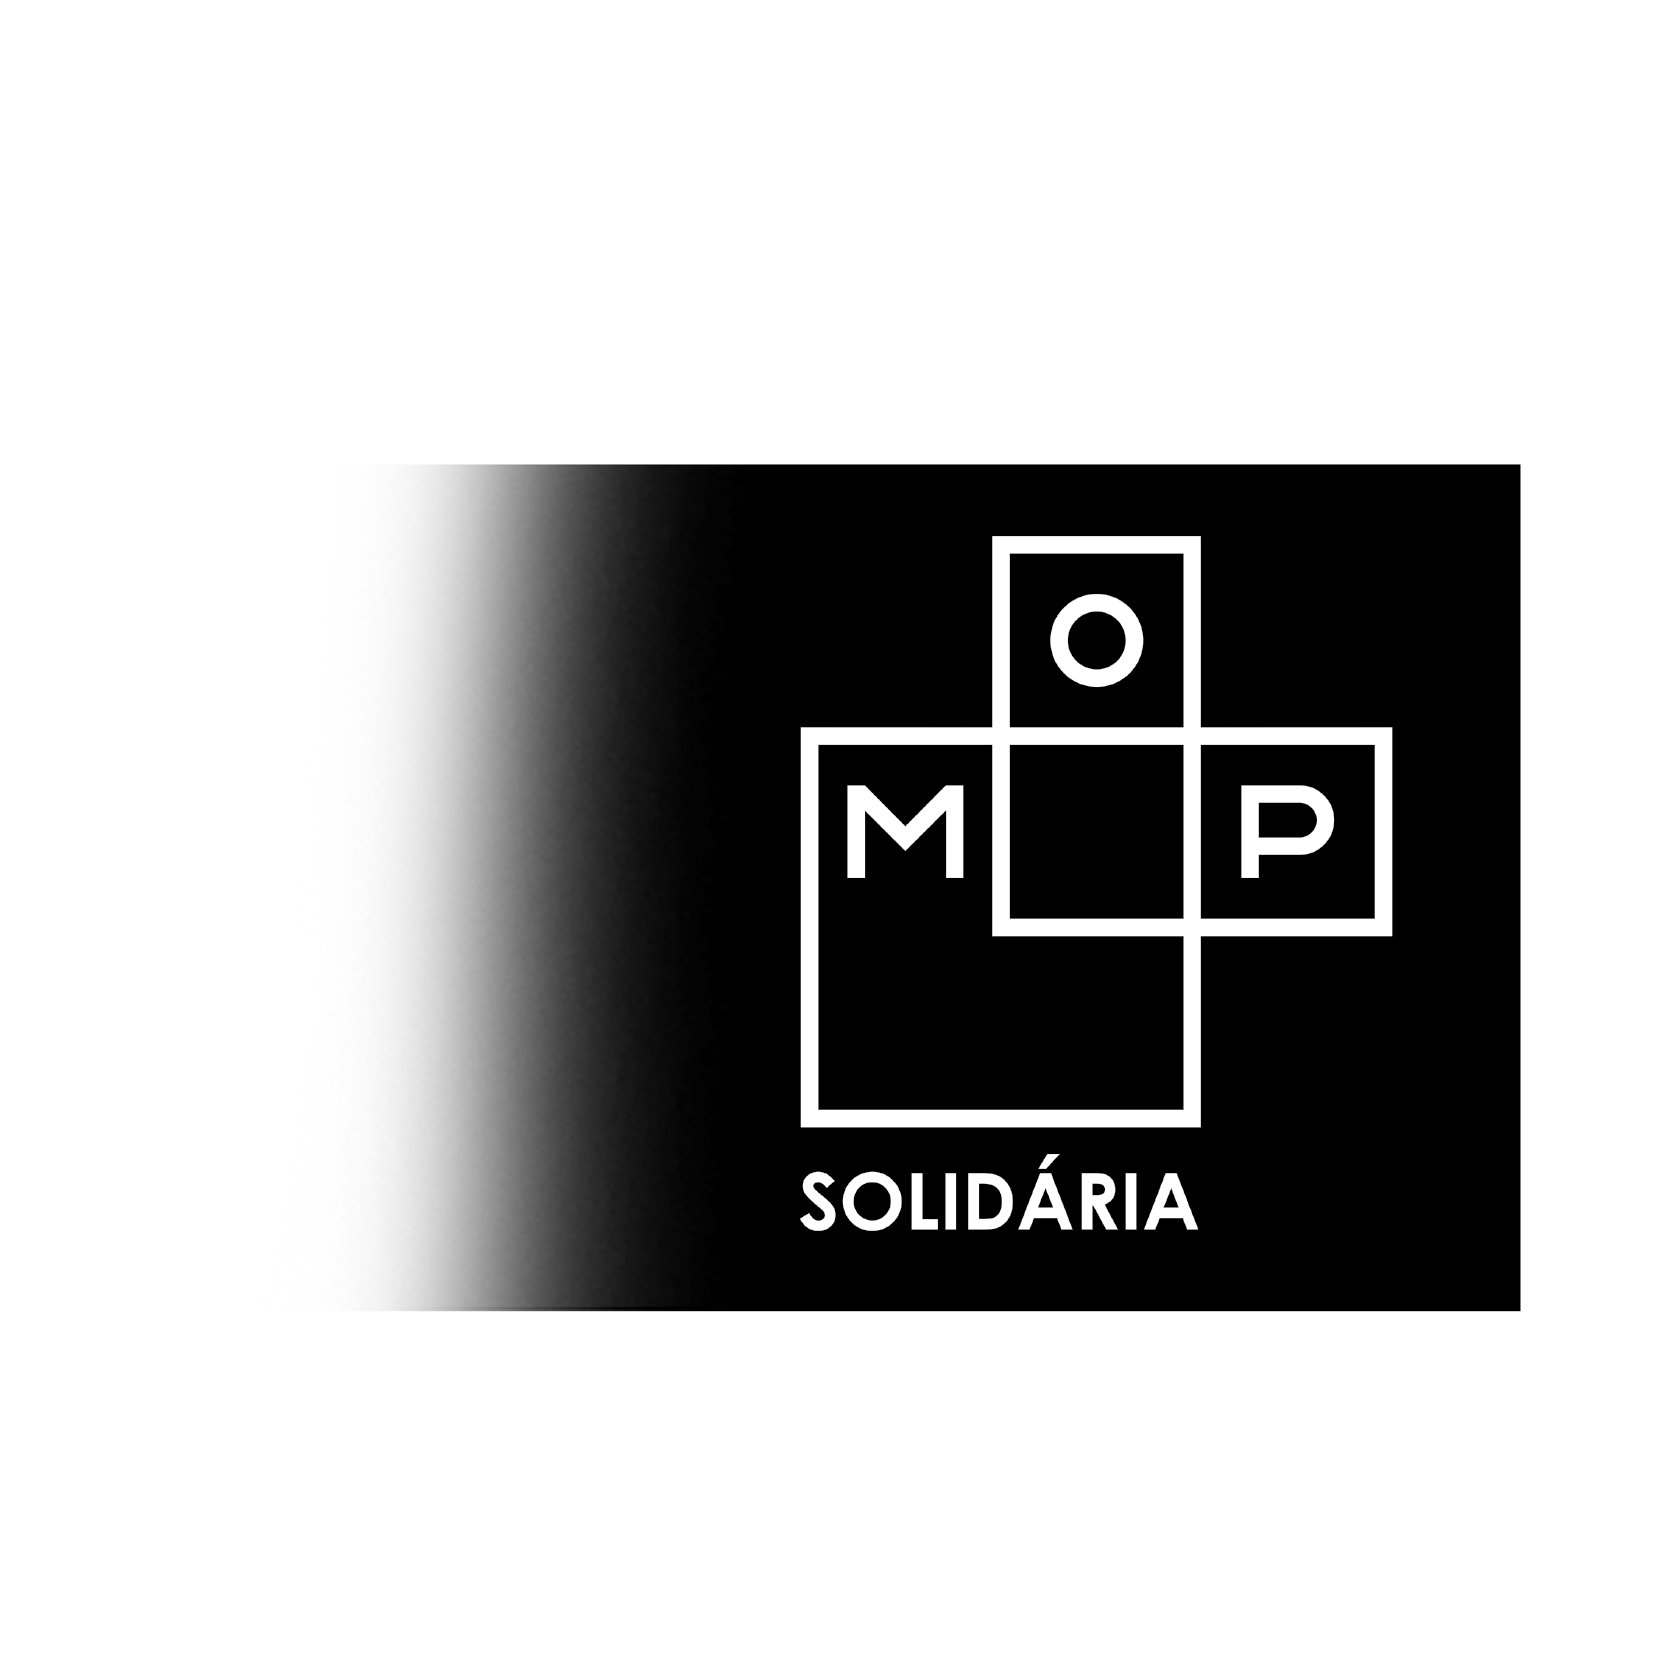 Logotipo_mop_preto